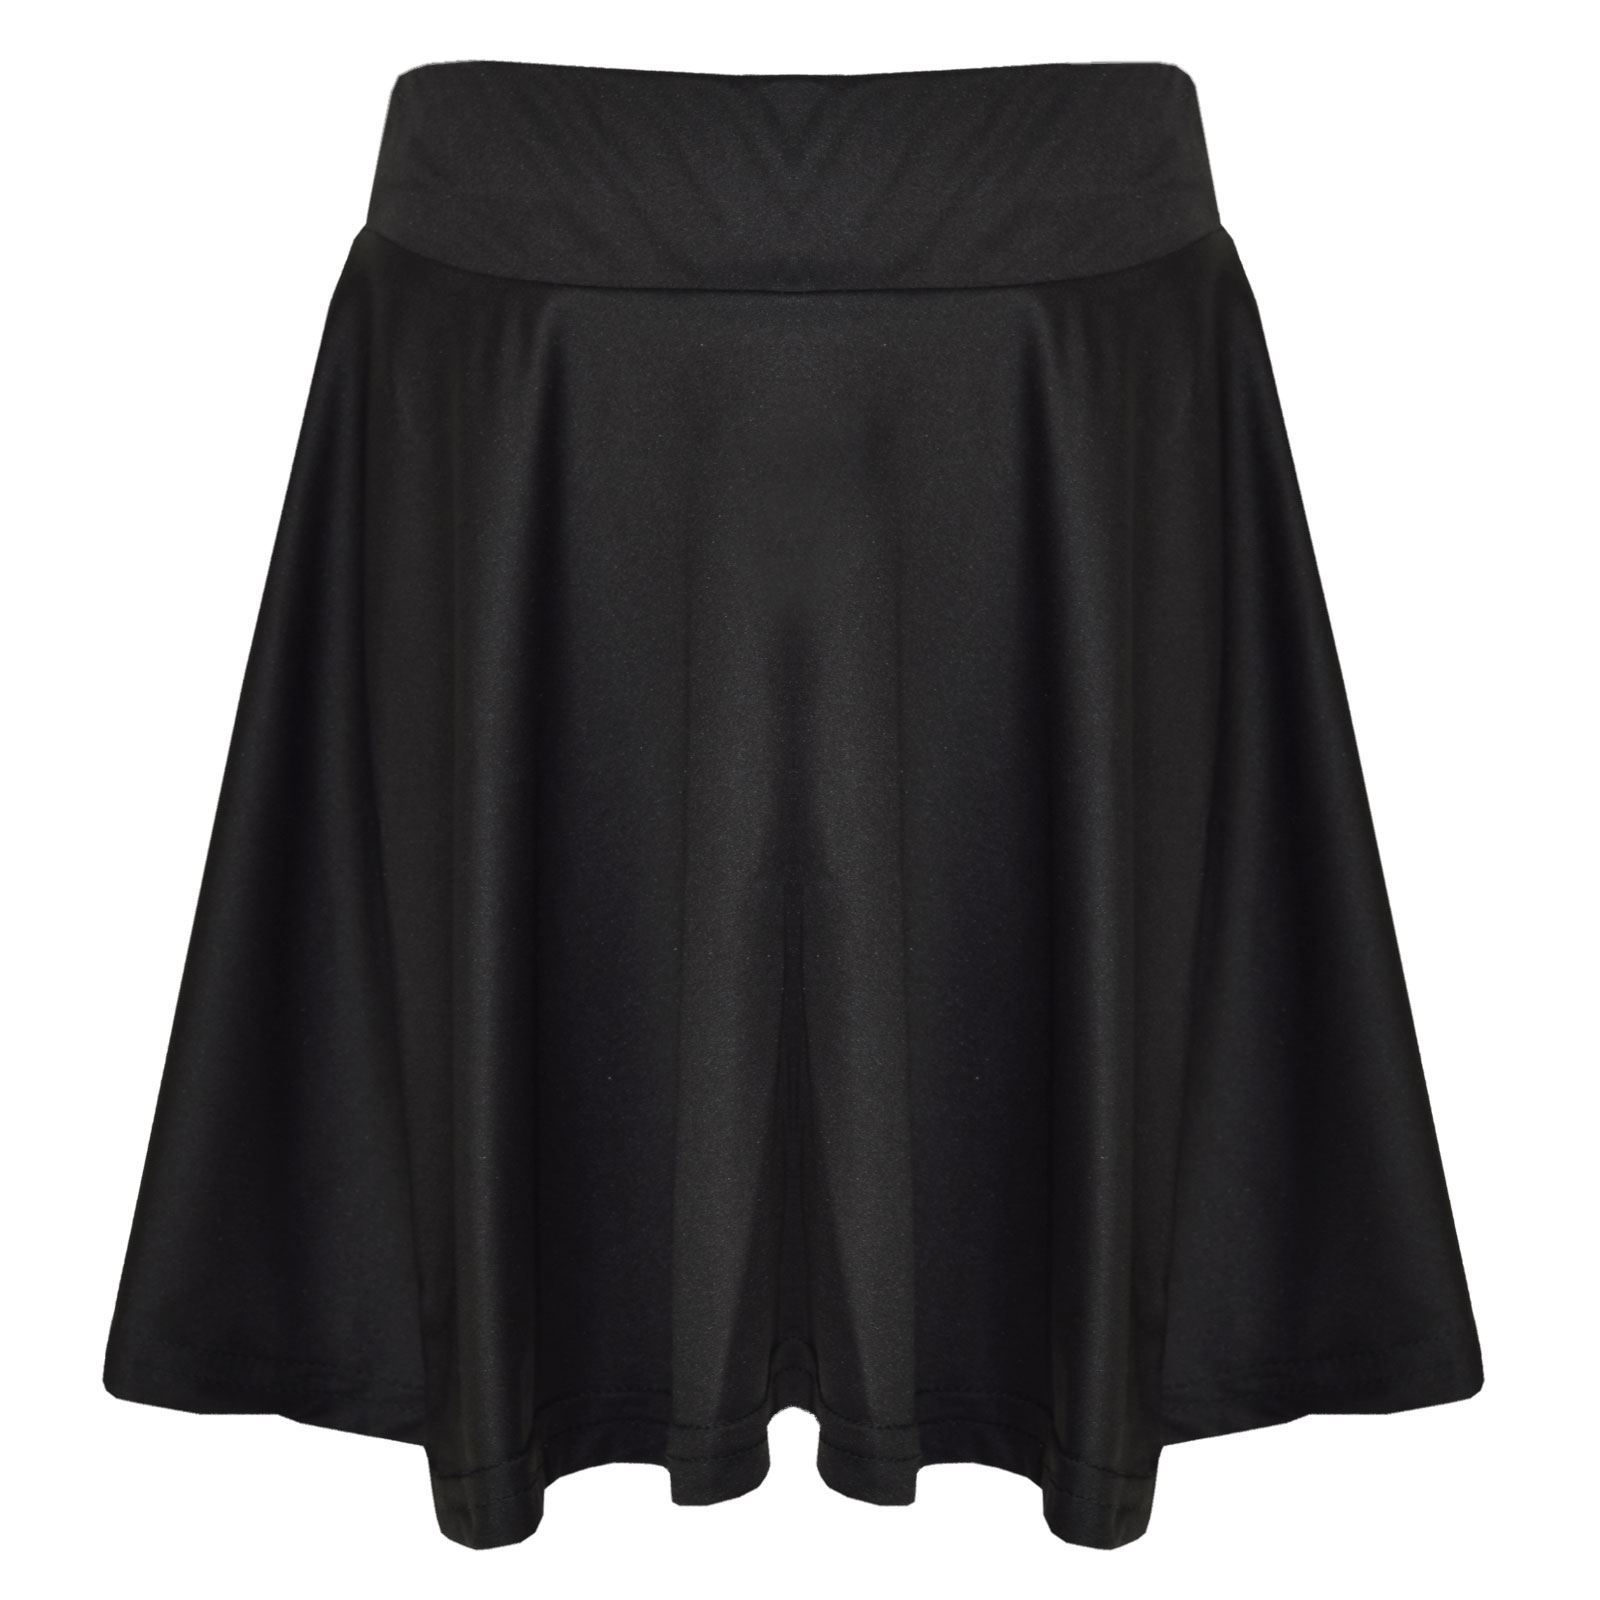 New Girls Skater Skirts School Fashion Summer Plain Skirts